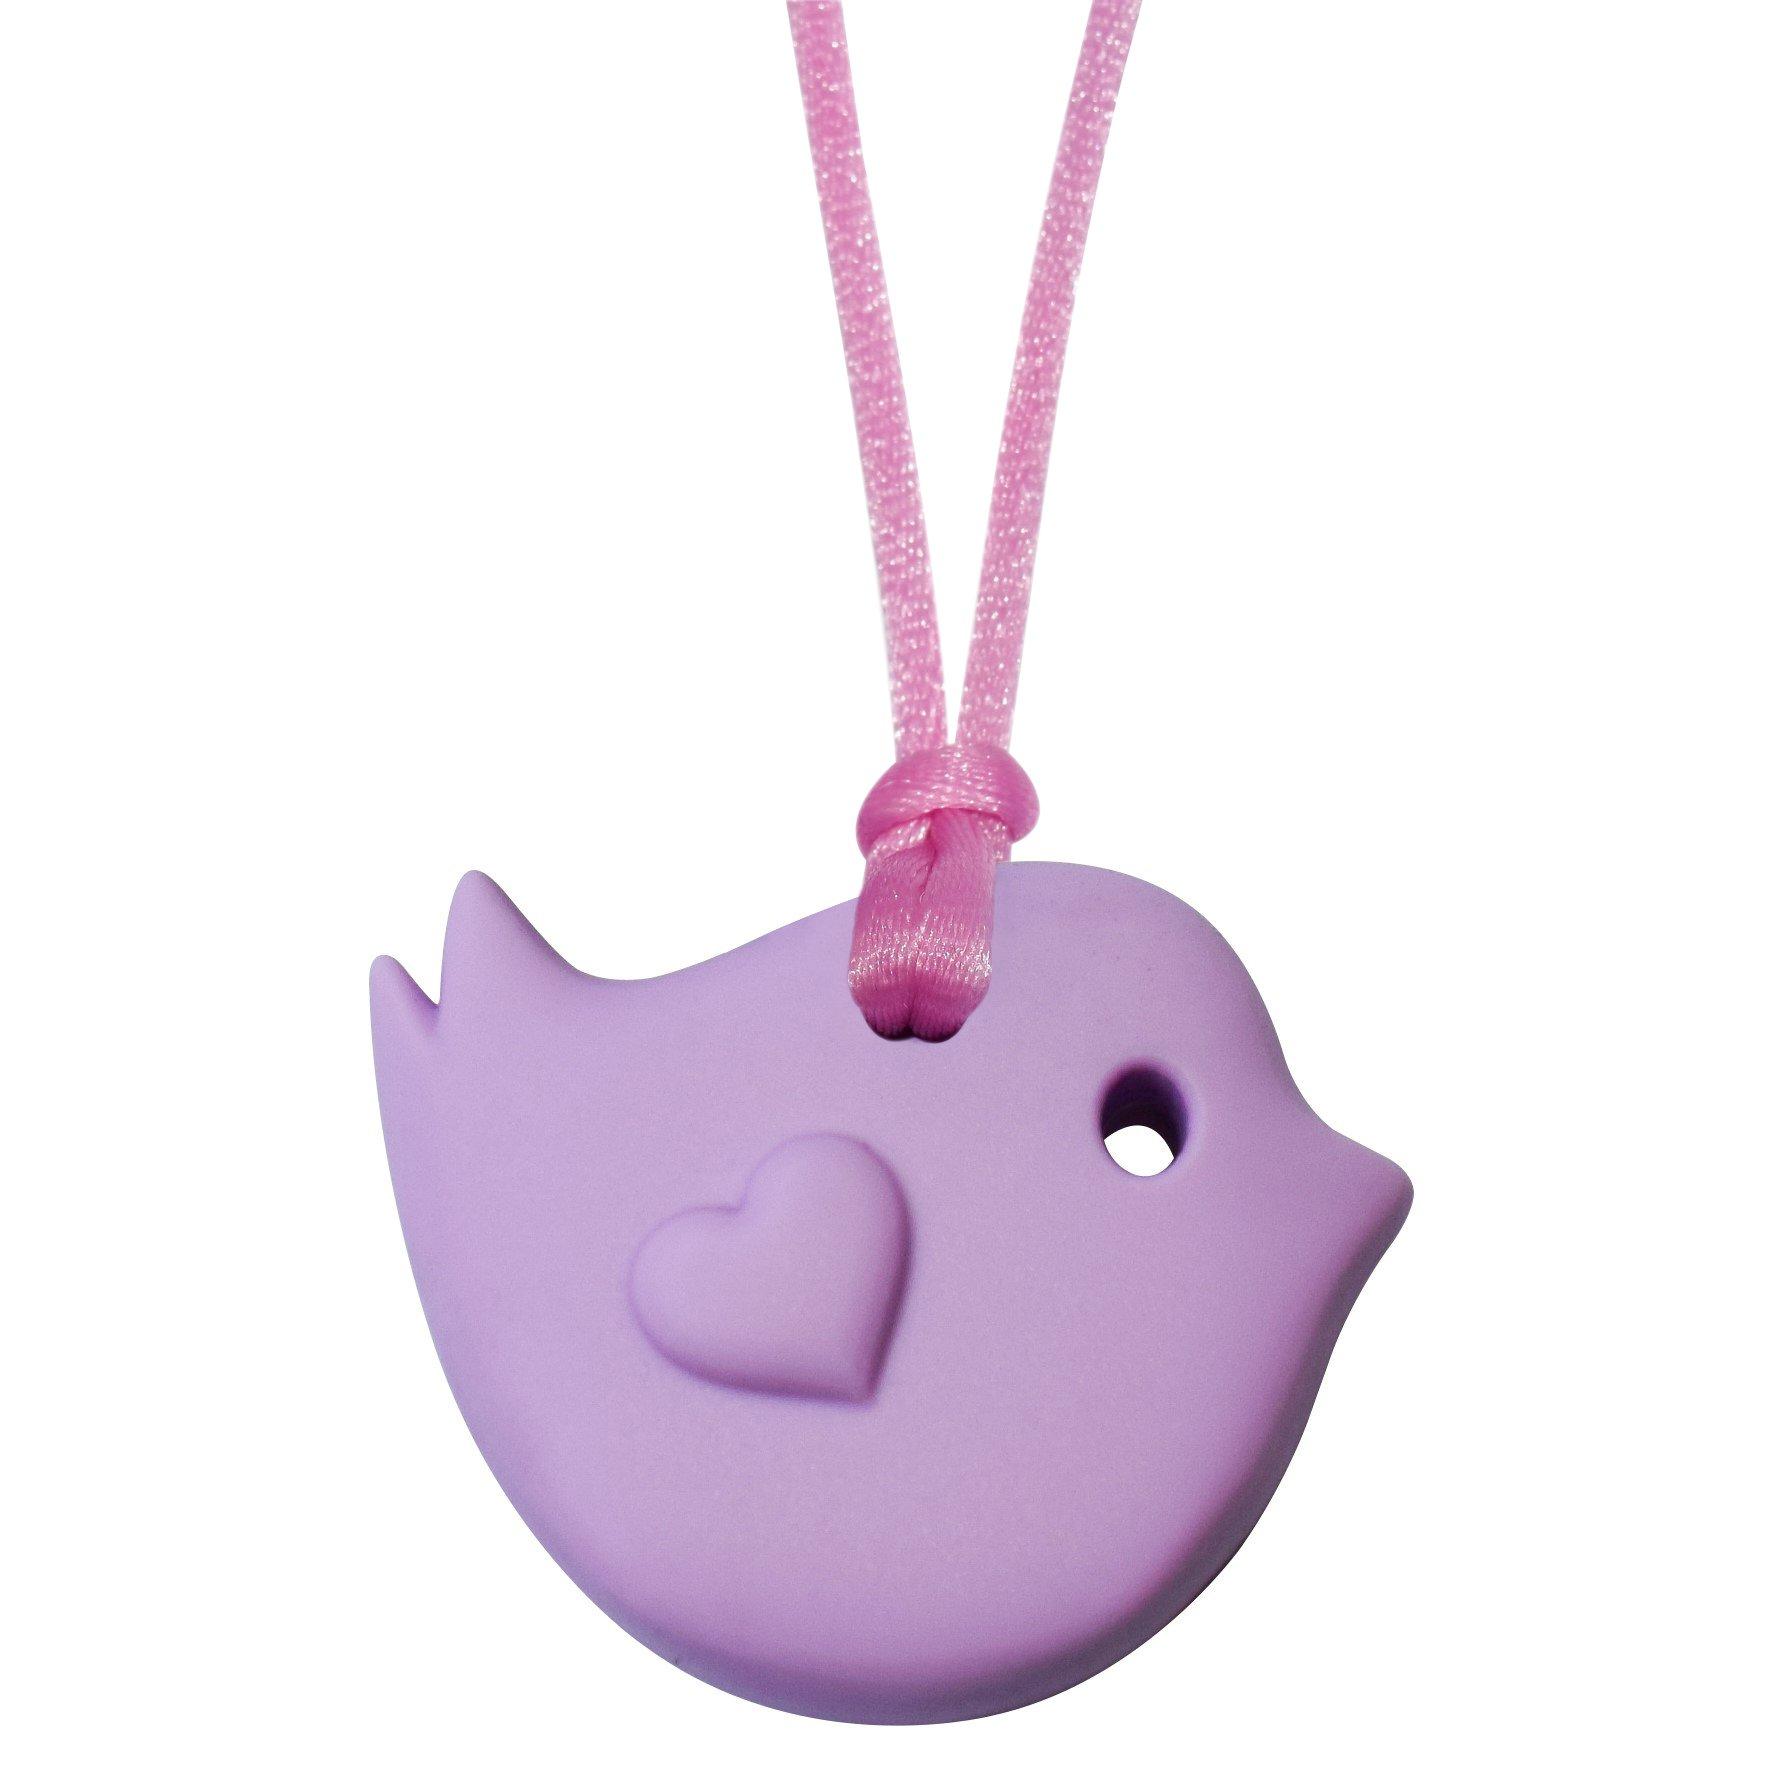 Girls' Sensory Chewy Necklace - Little Bird Chewelry (Purple)